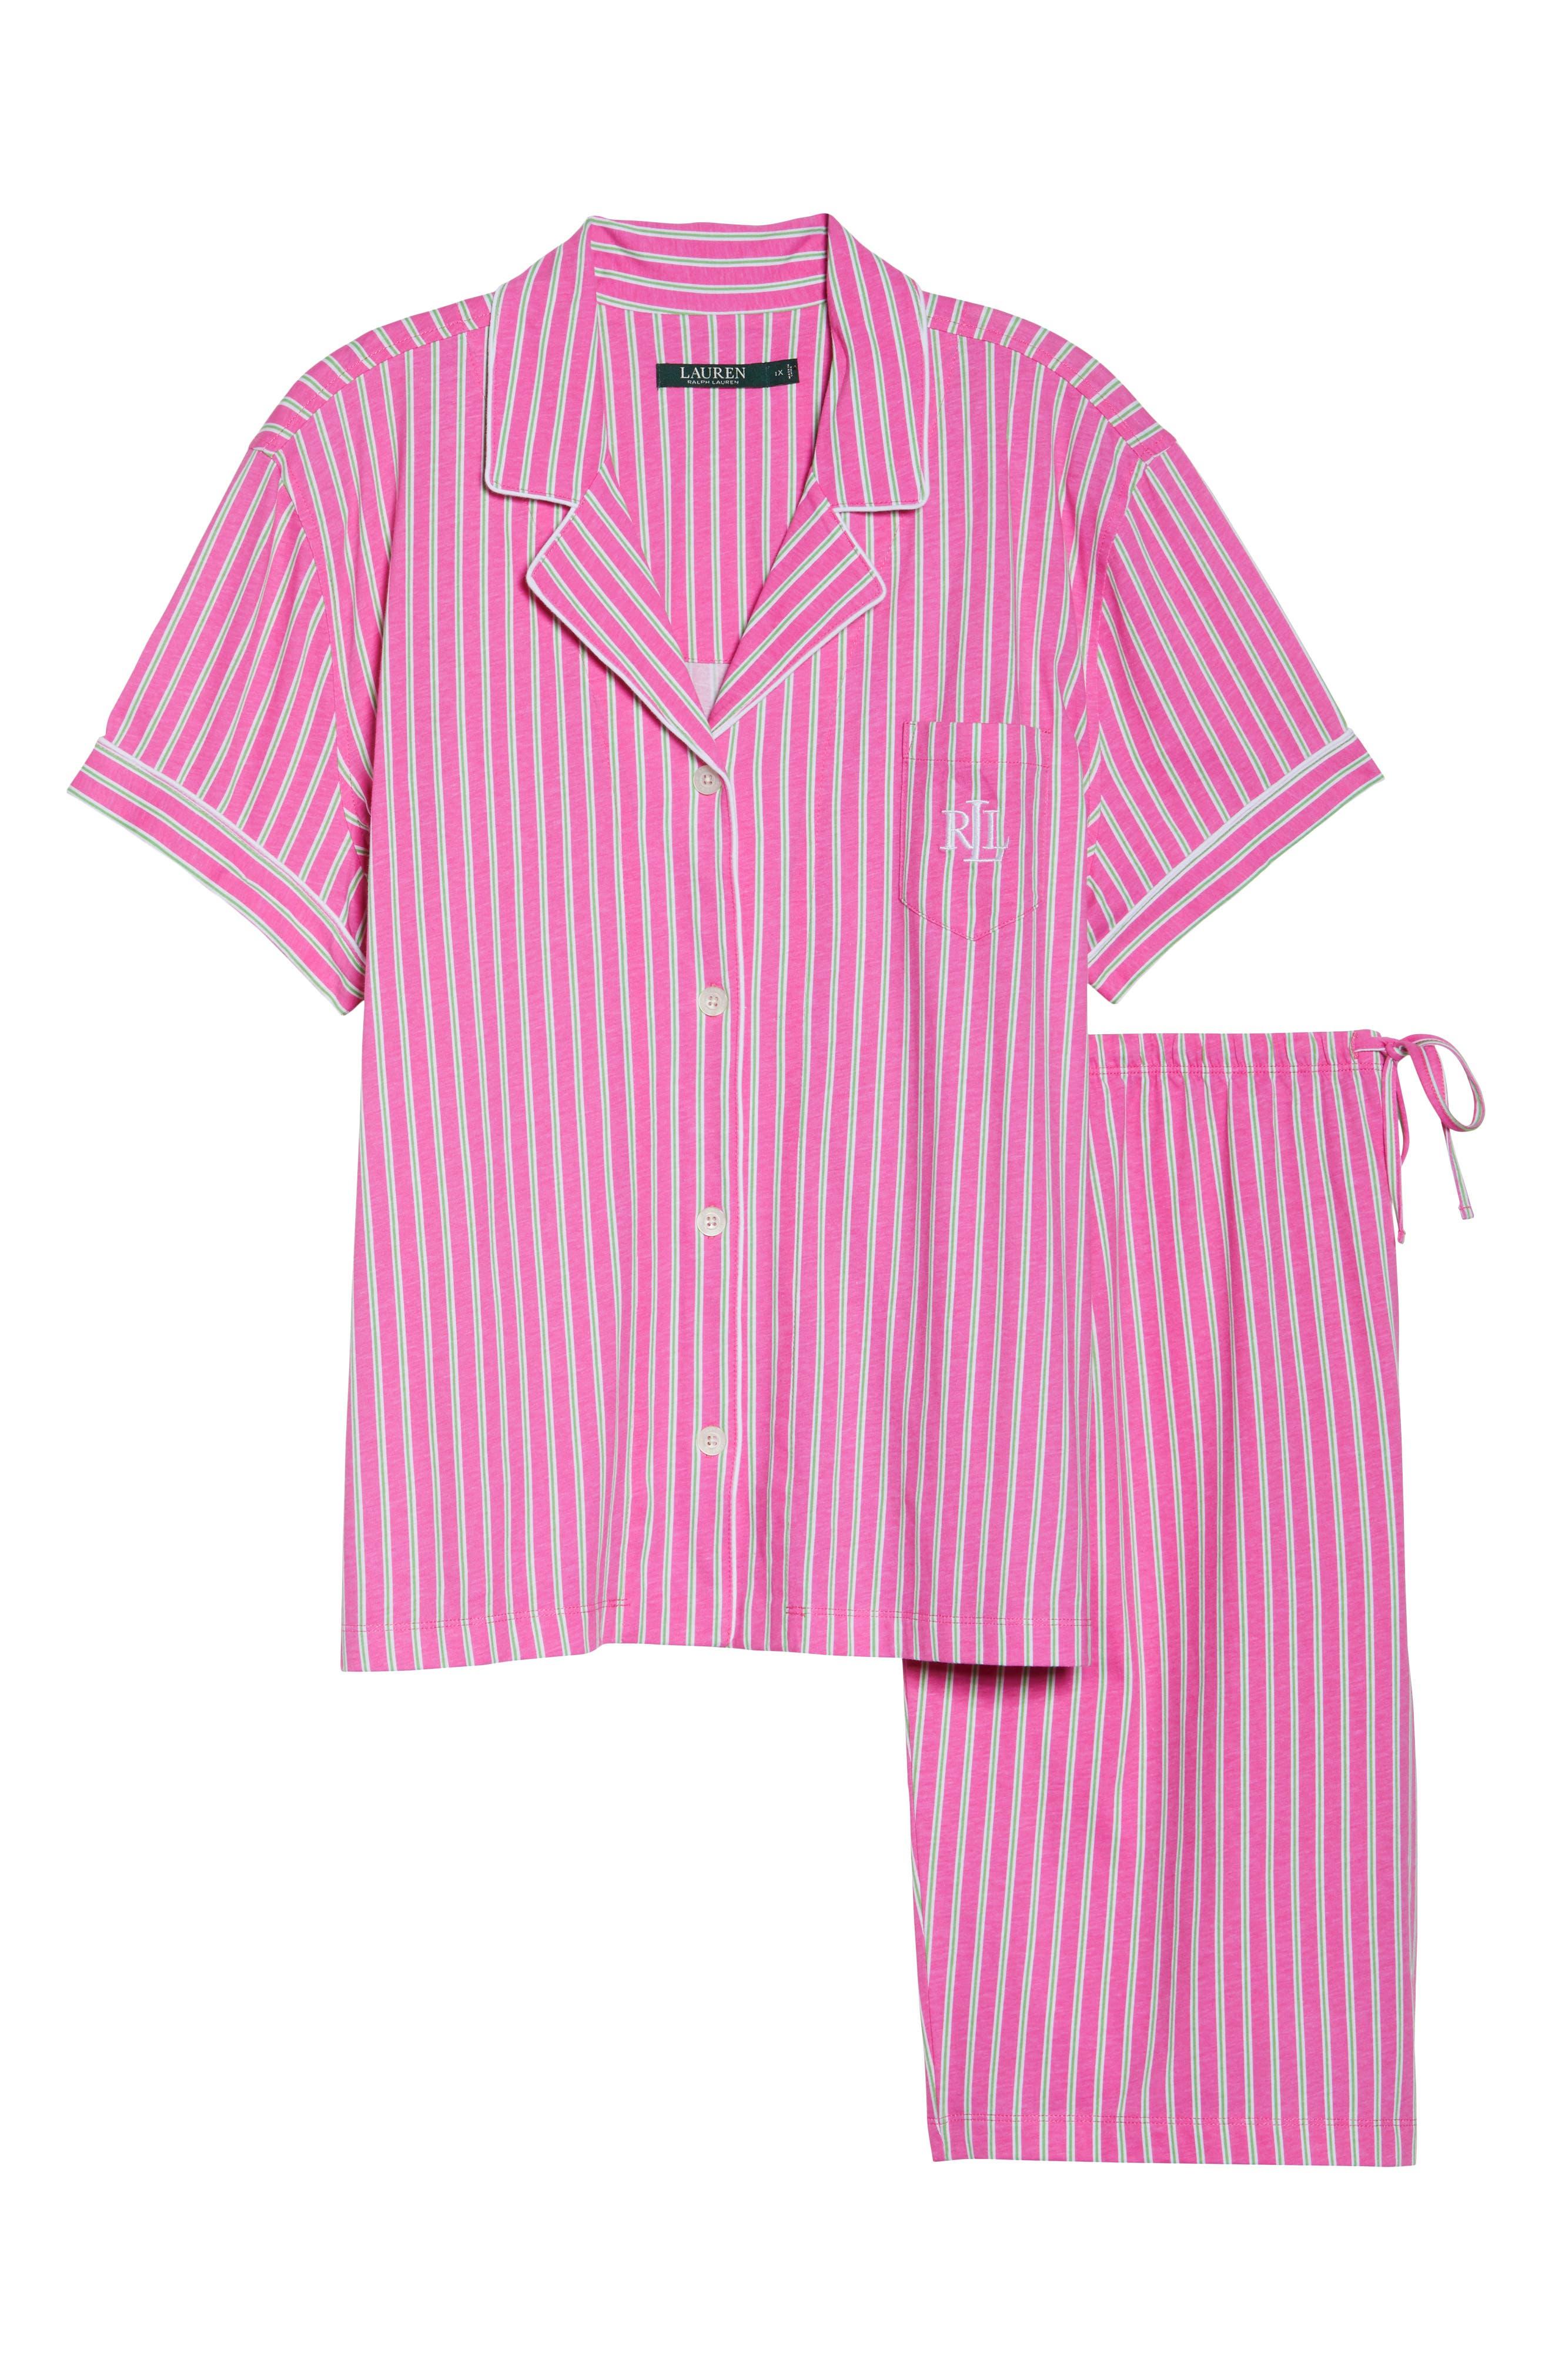 Bermuda Pajamas,                             Alternate thumbnail 6, color,